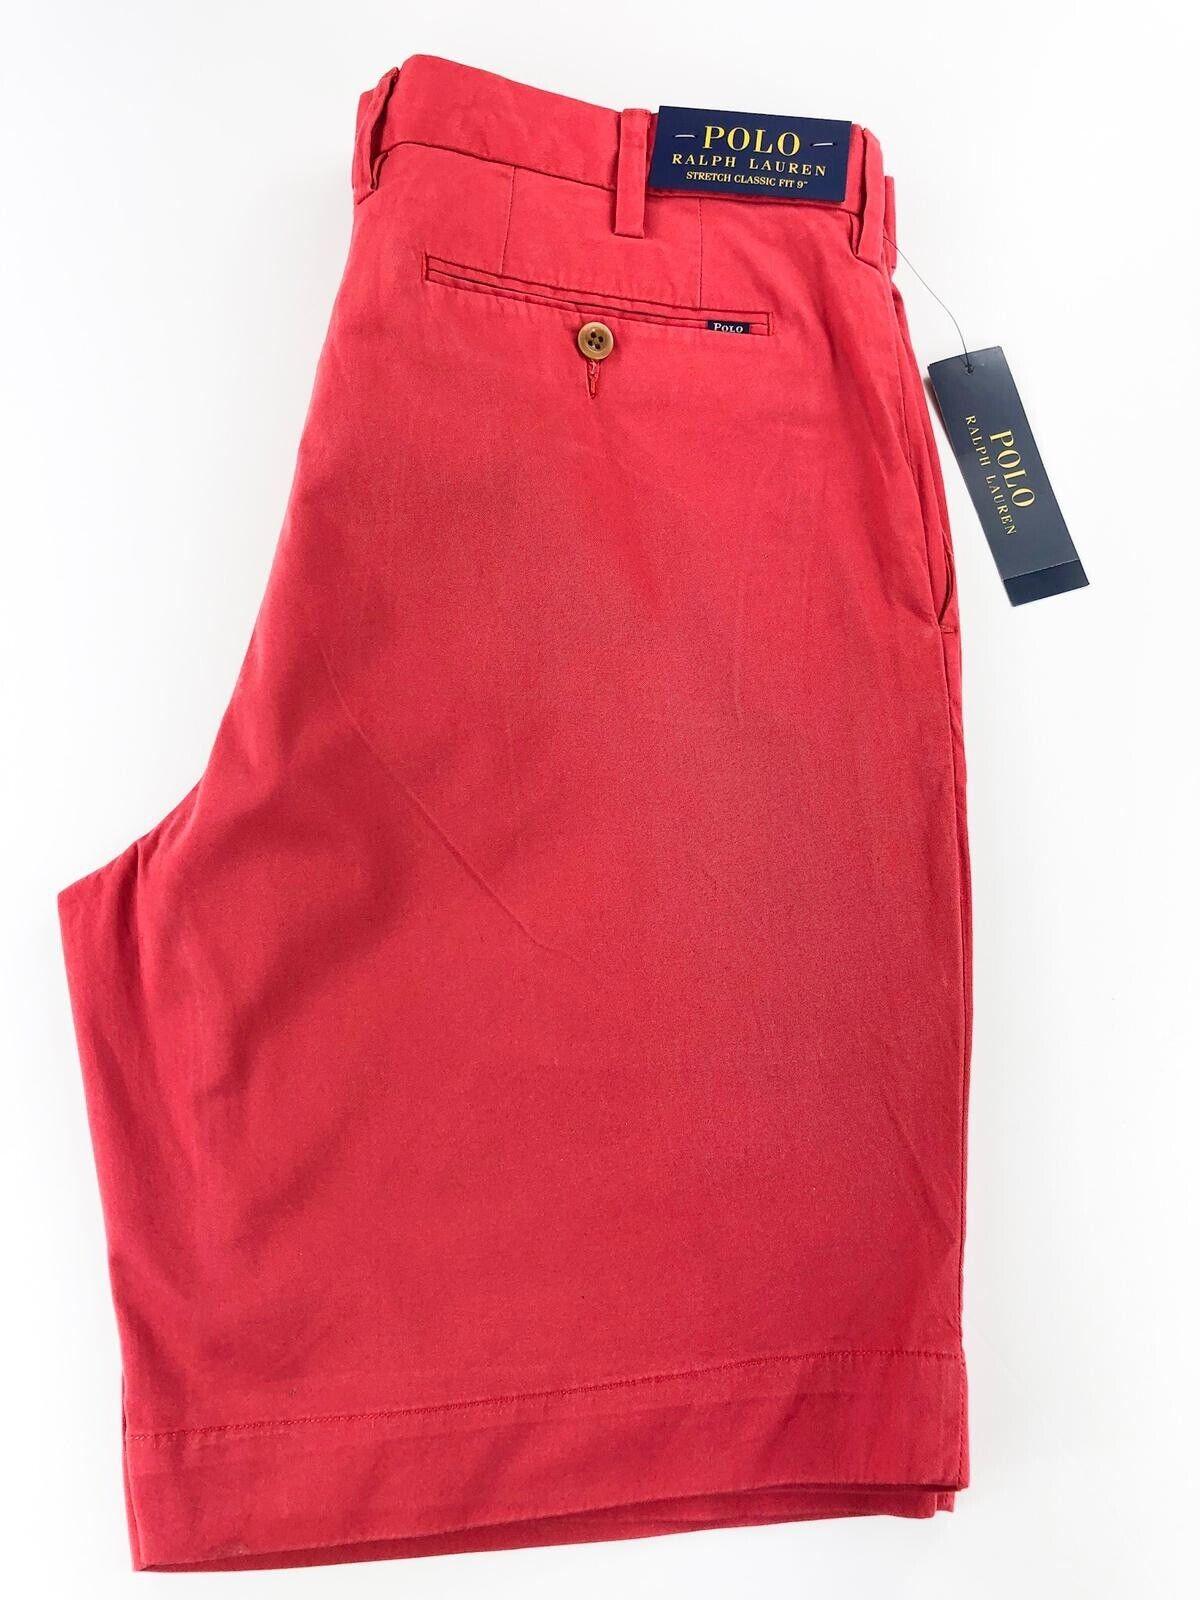 "Ralph Lauren Stretch Red Classic Fit 9"" Short."